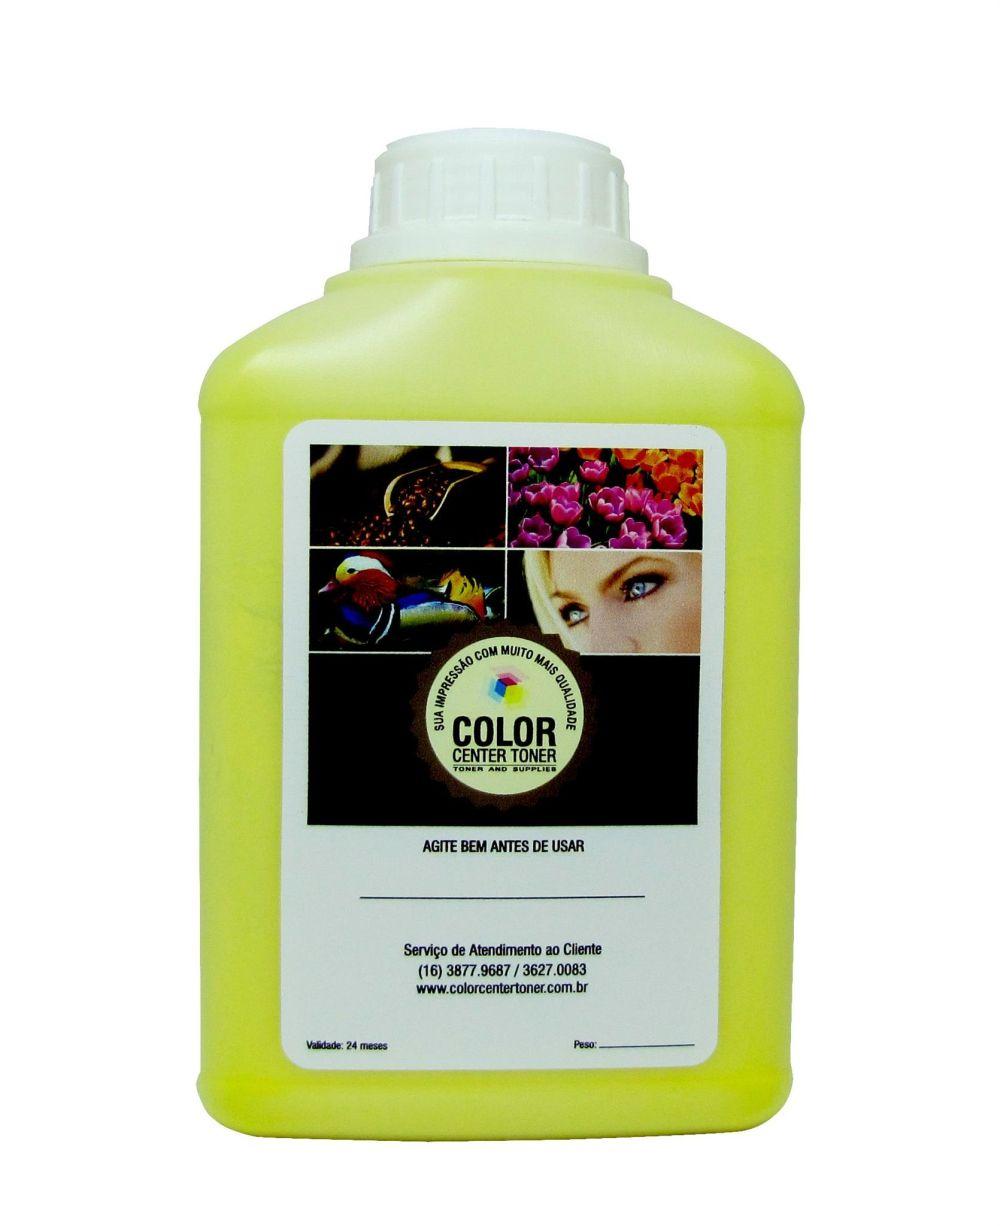 Refil de Toner Okidata C910 Amarelo